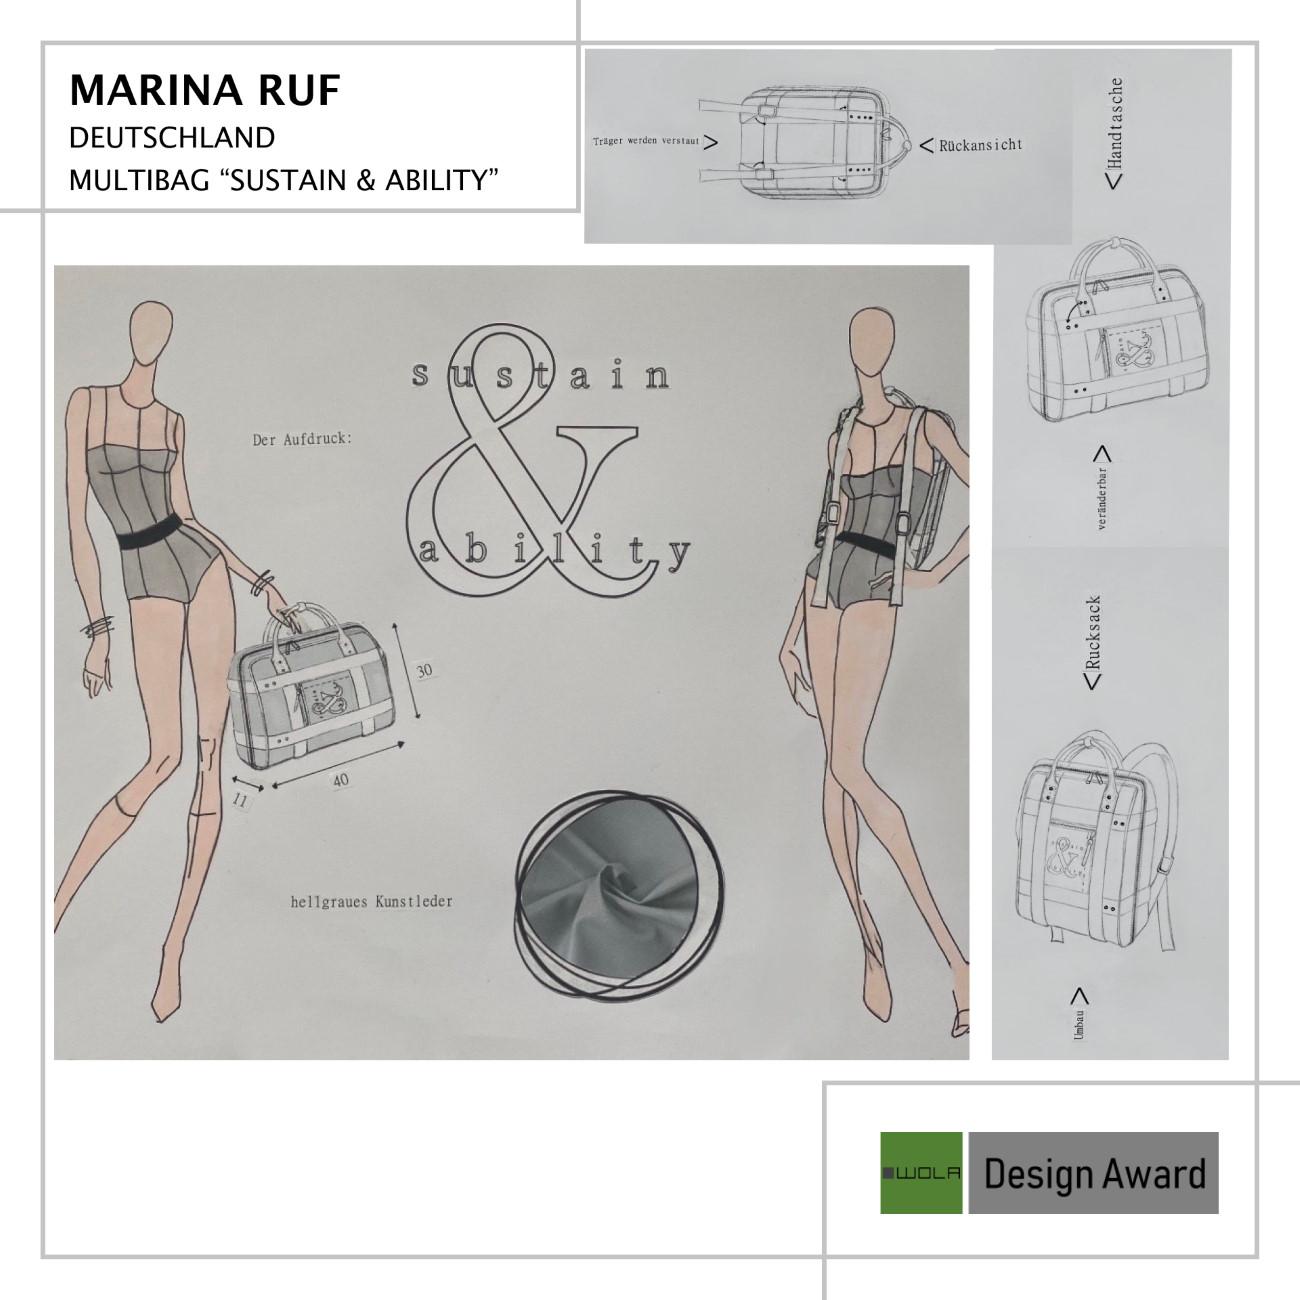 Beitrag WOLA Design Award -Marina Ruf